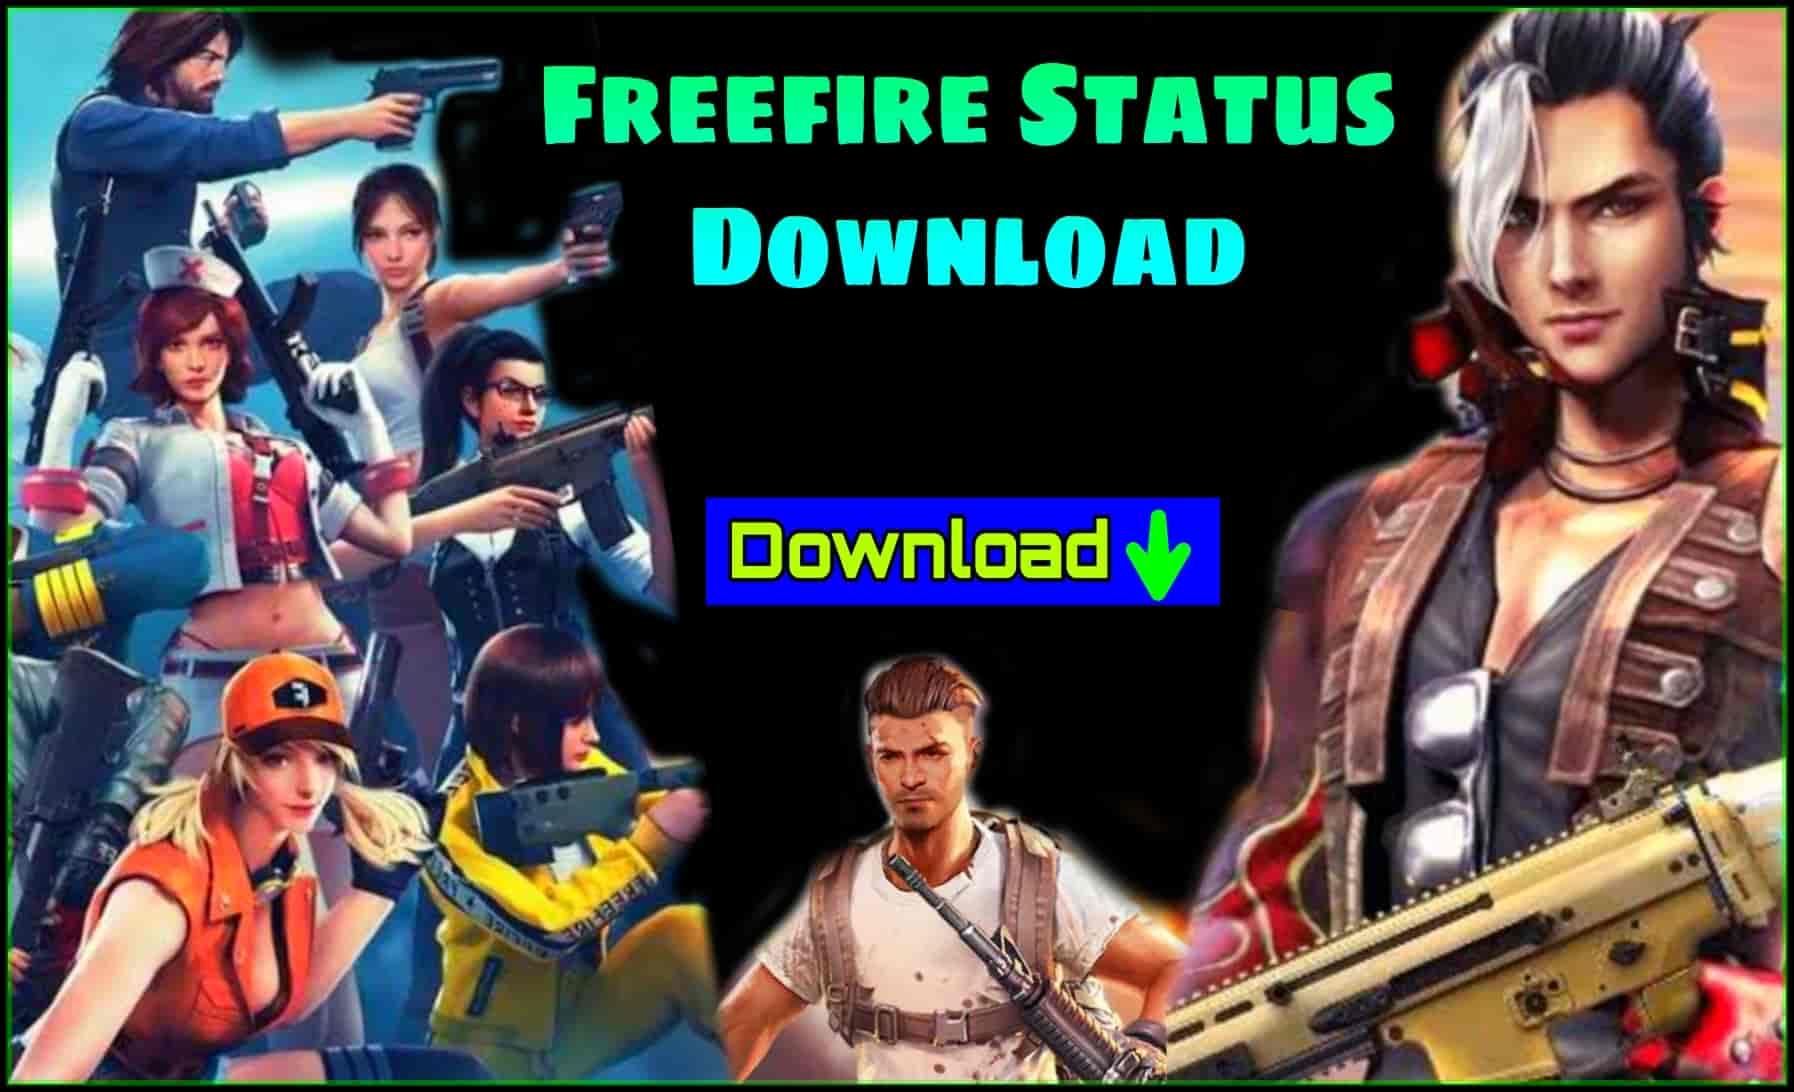 Freefire Video Status Download